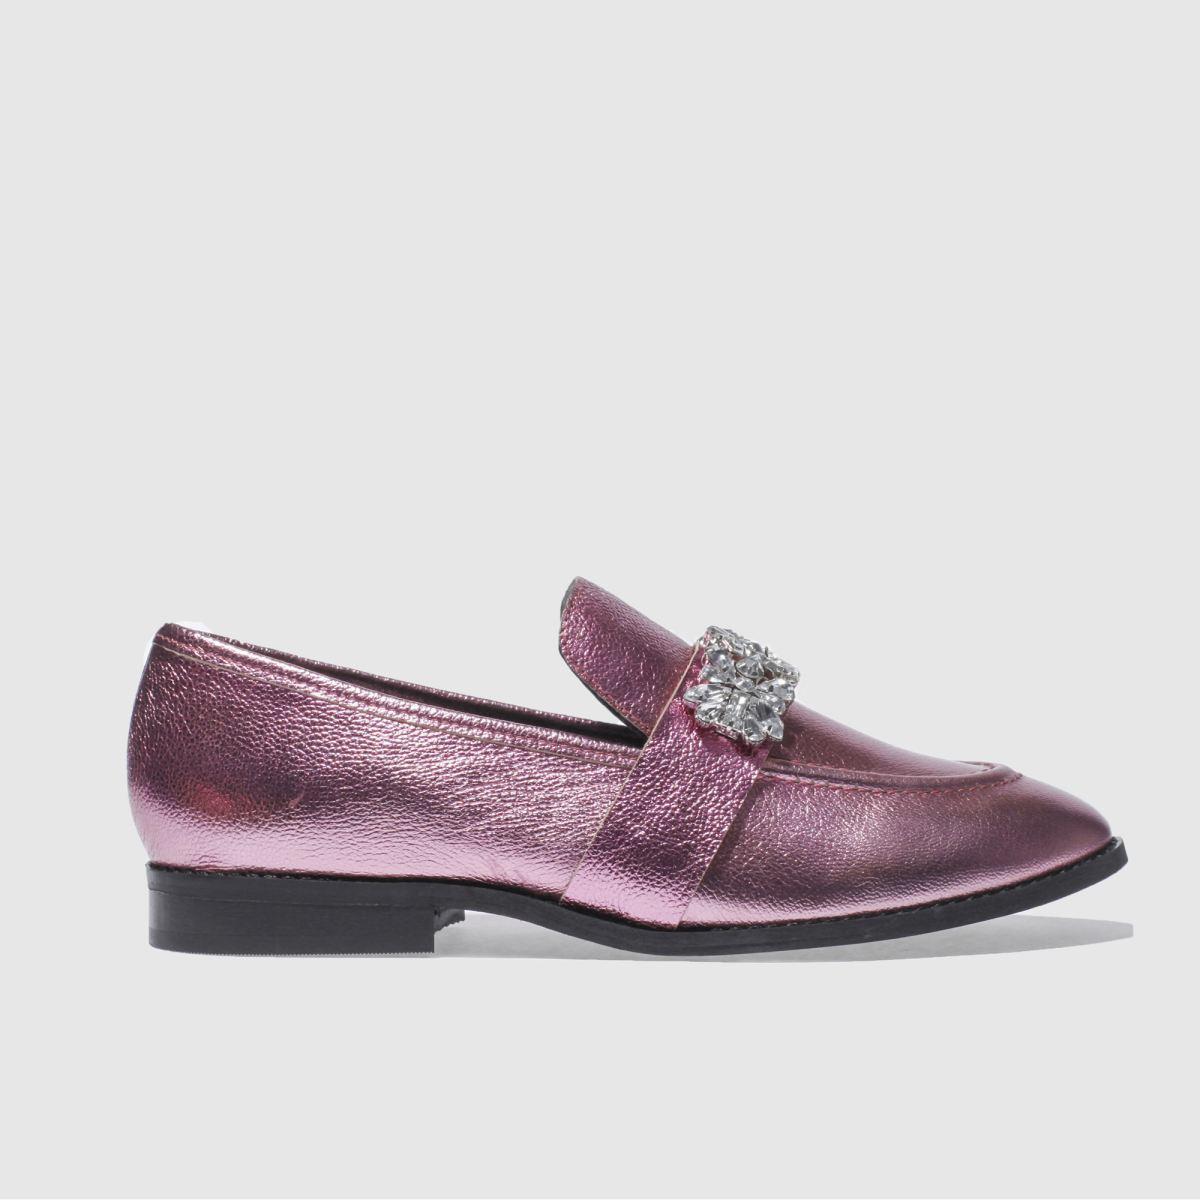 schuh pink lavish flat shoes